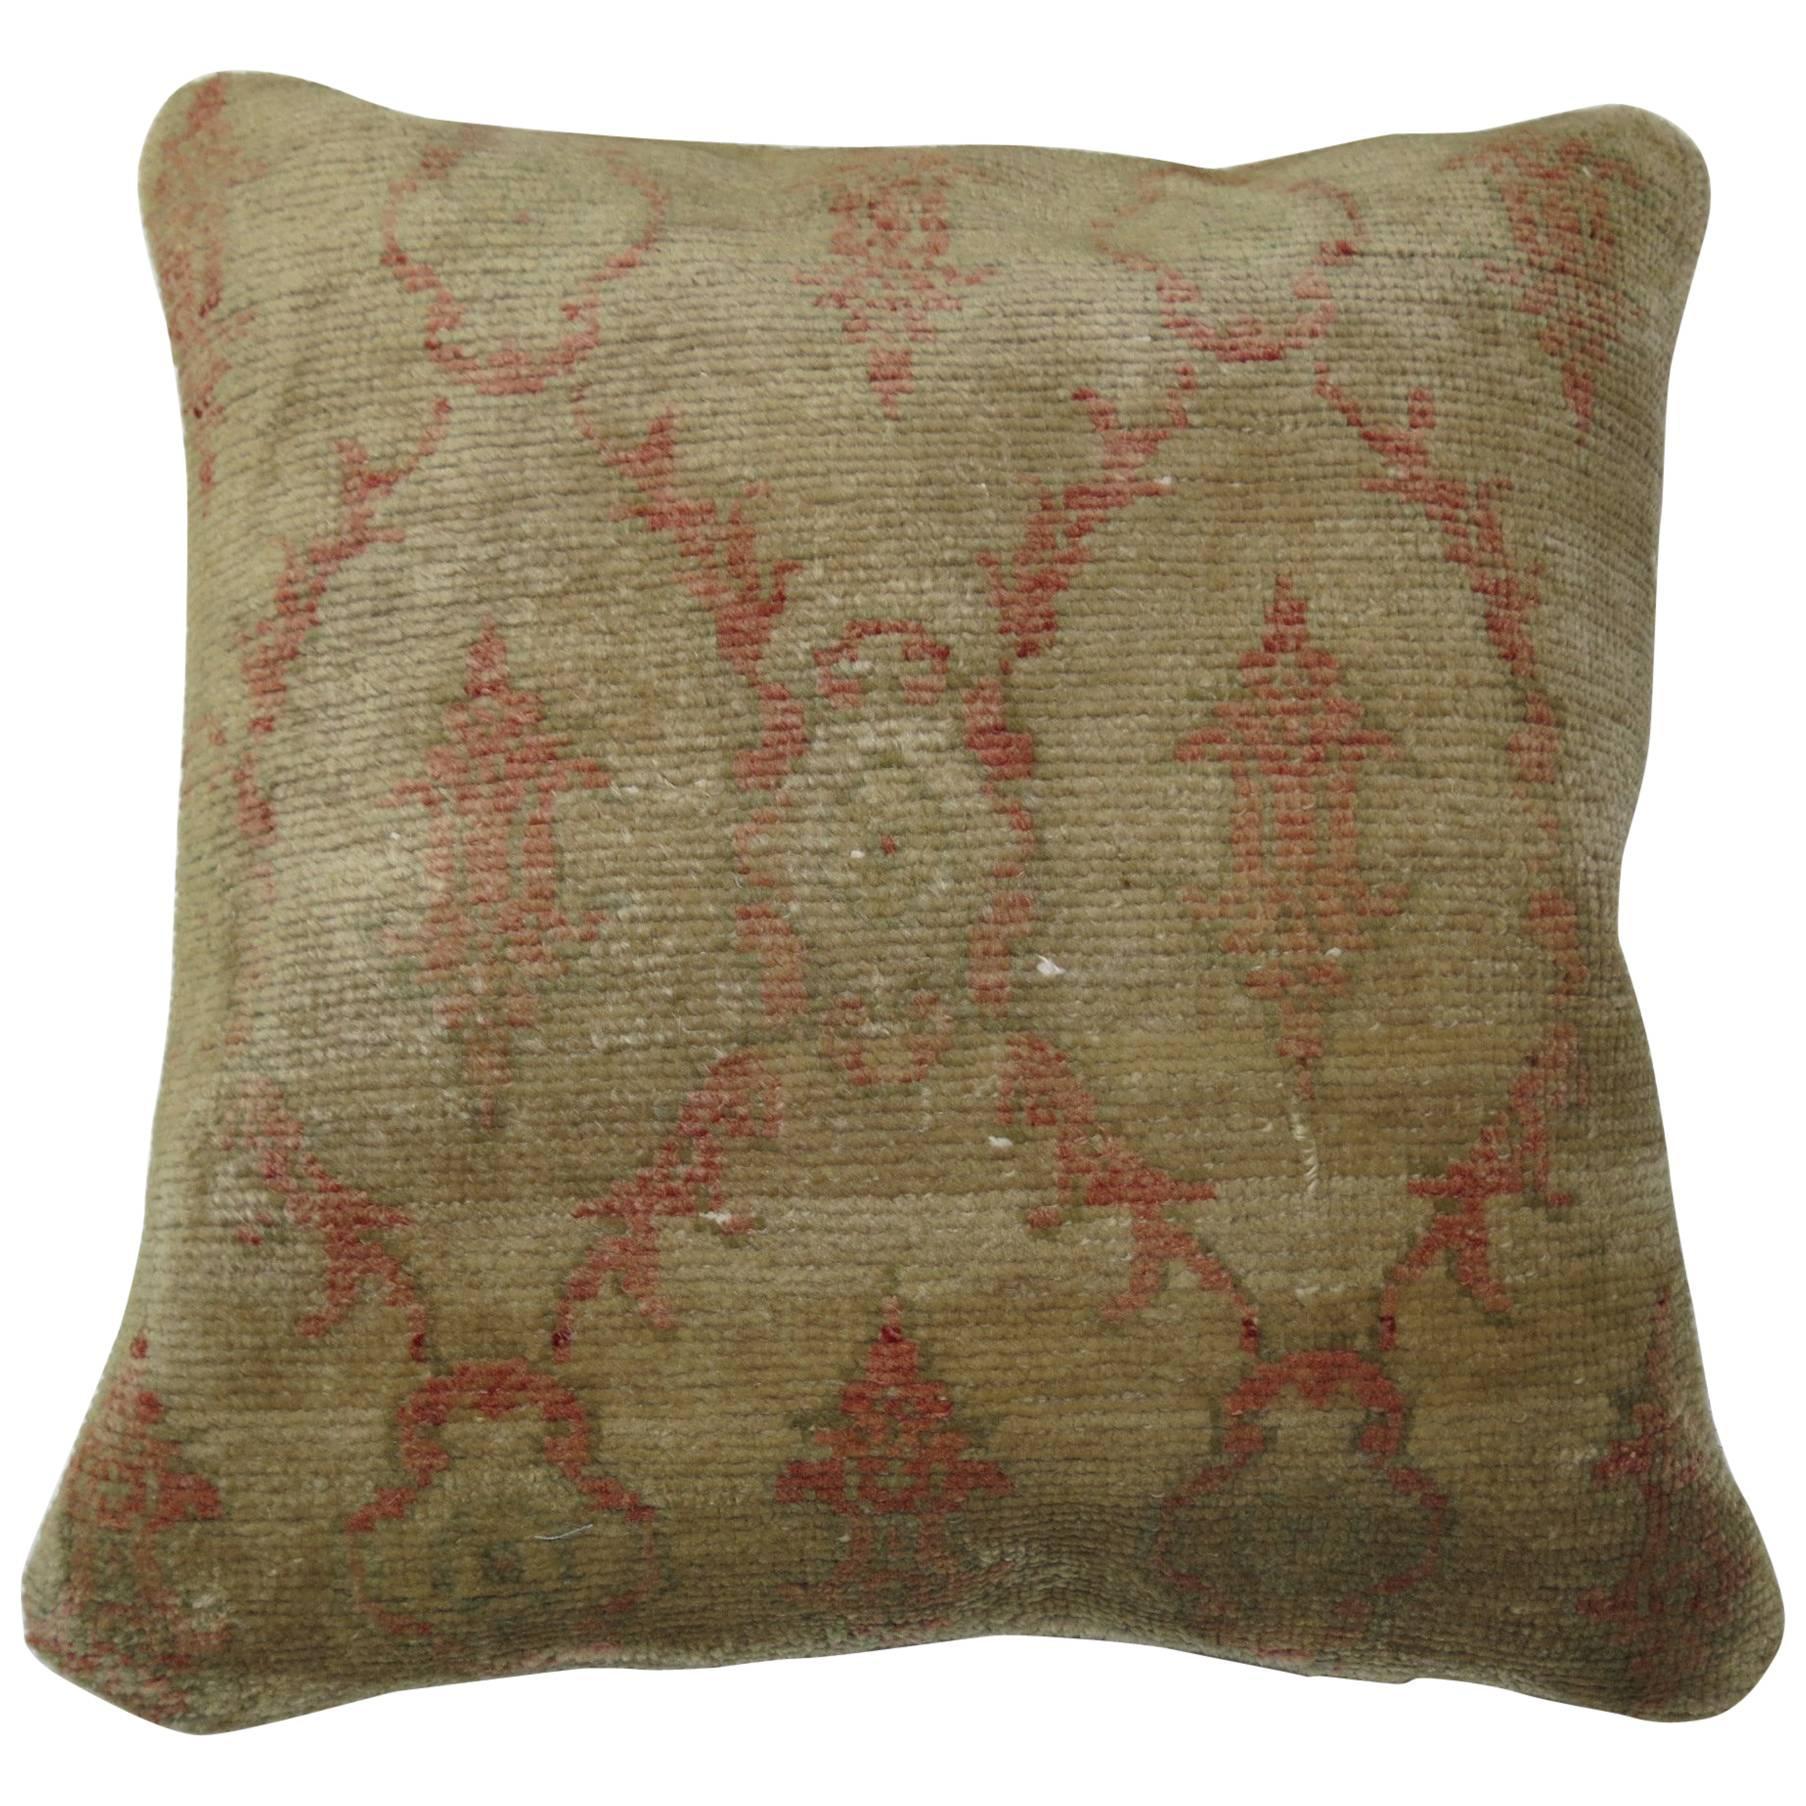 Turkish Modernist Rug Pillow